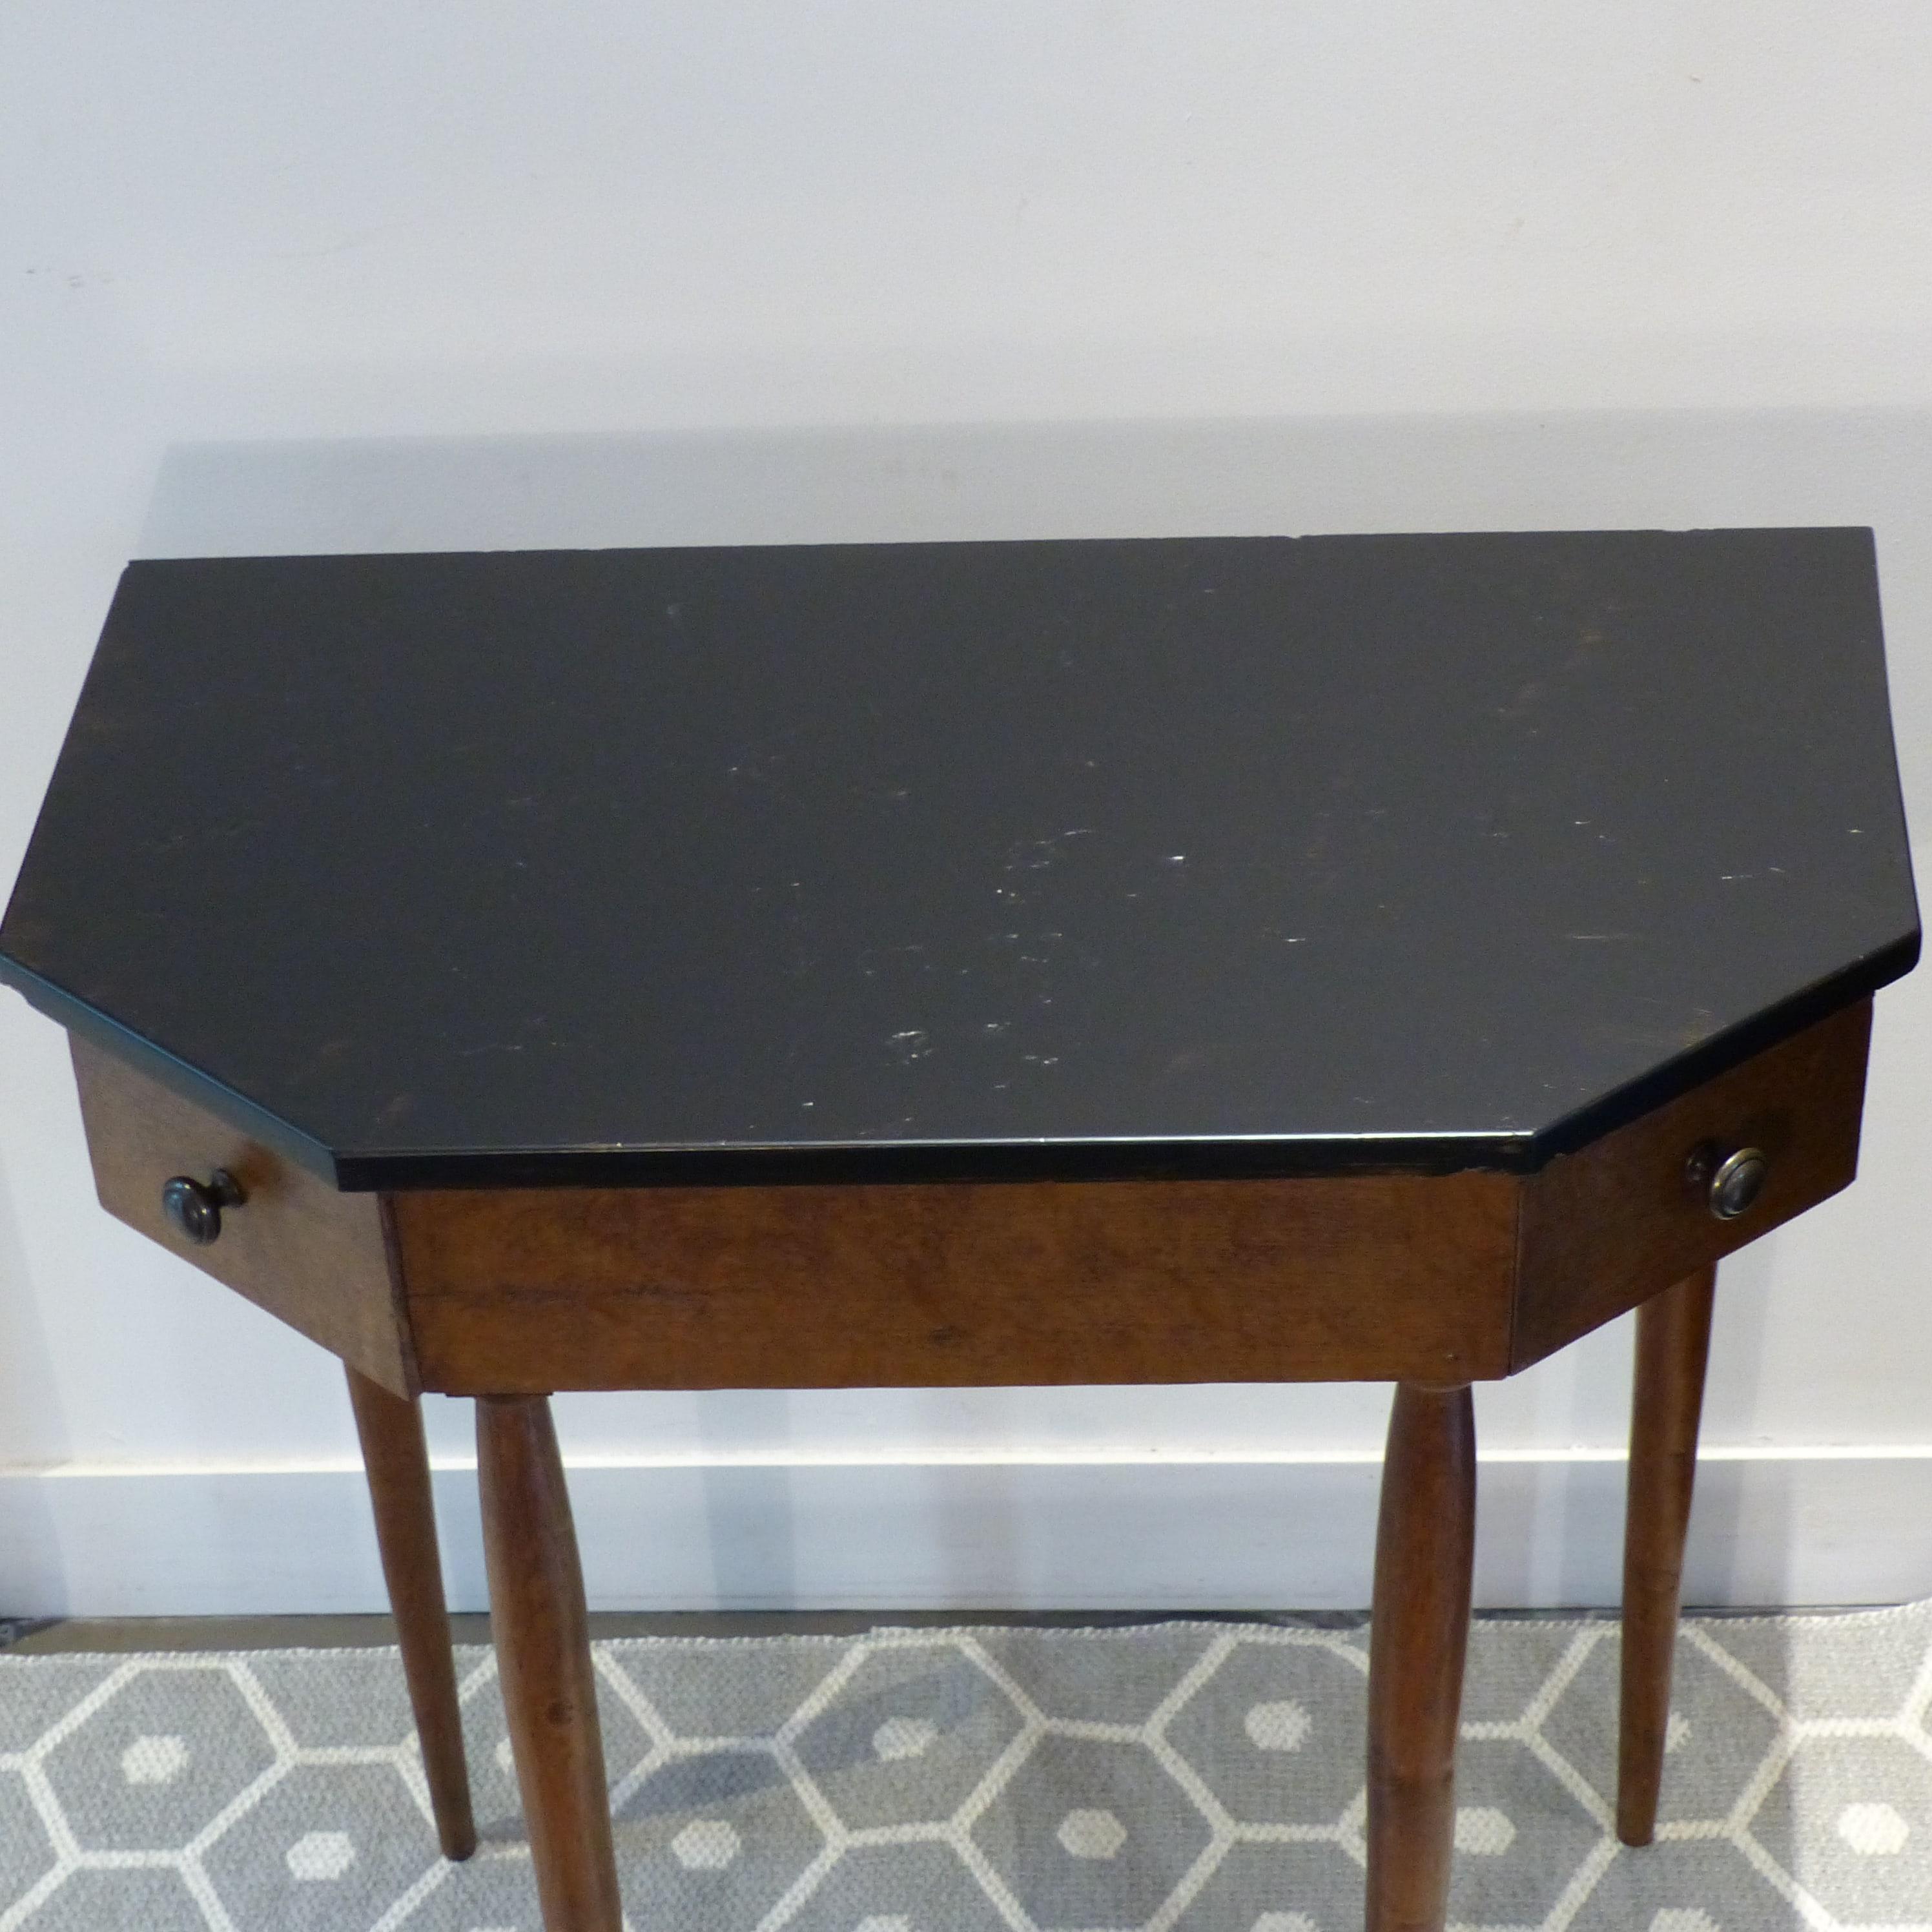 petite console de m tier lignedebrocante brocante en. Black Bedroom Furniture Sets. Home Design Ideas